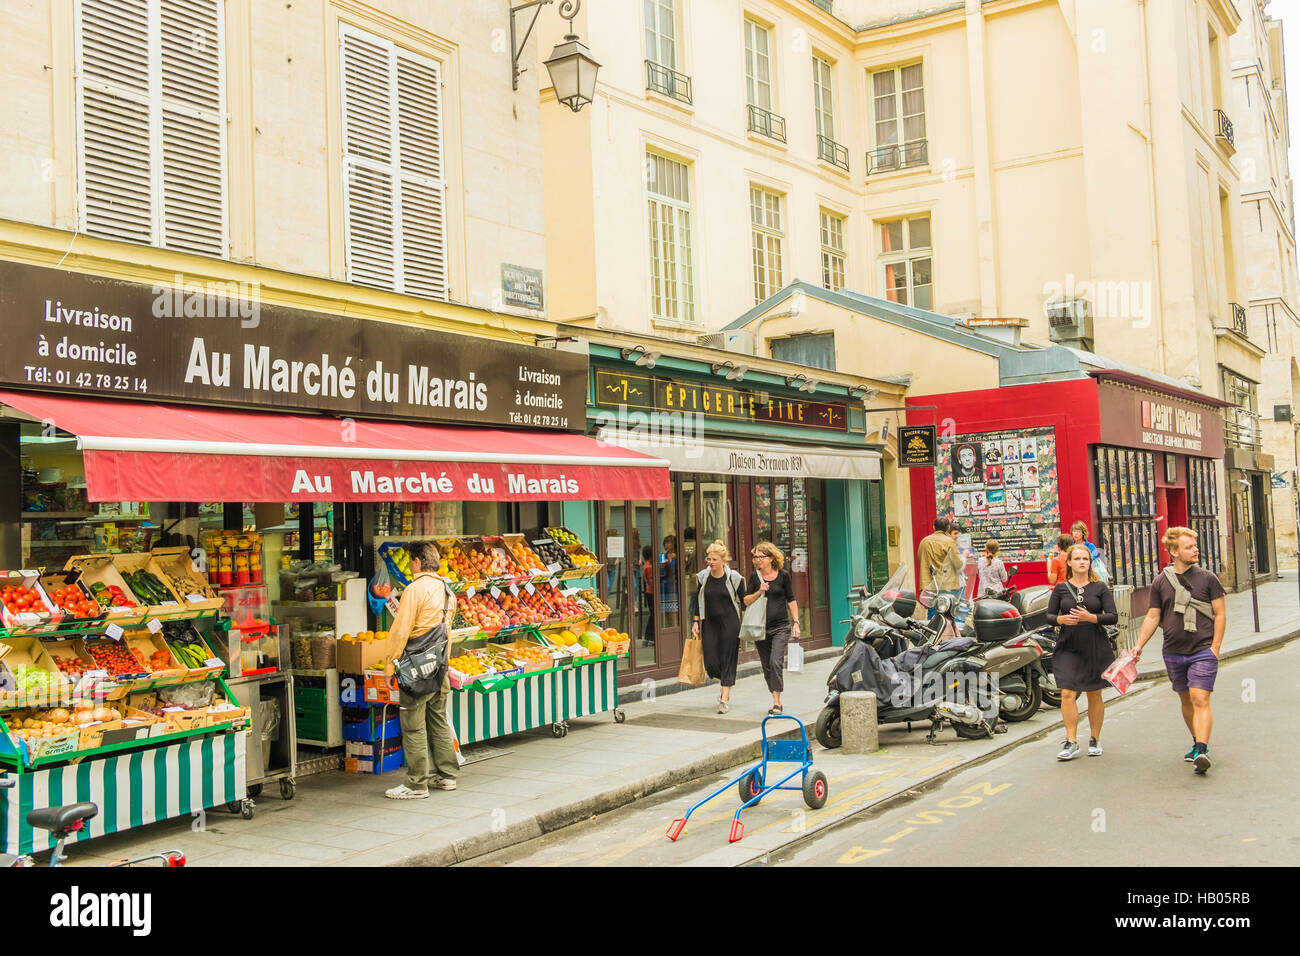 street scene in front of  au marché du marais , grocery store, marais district Stock Photo